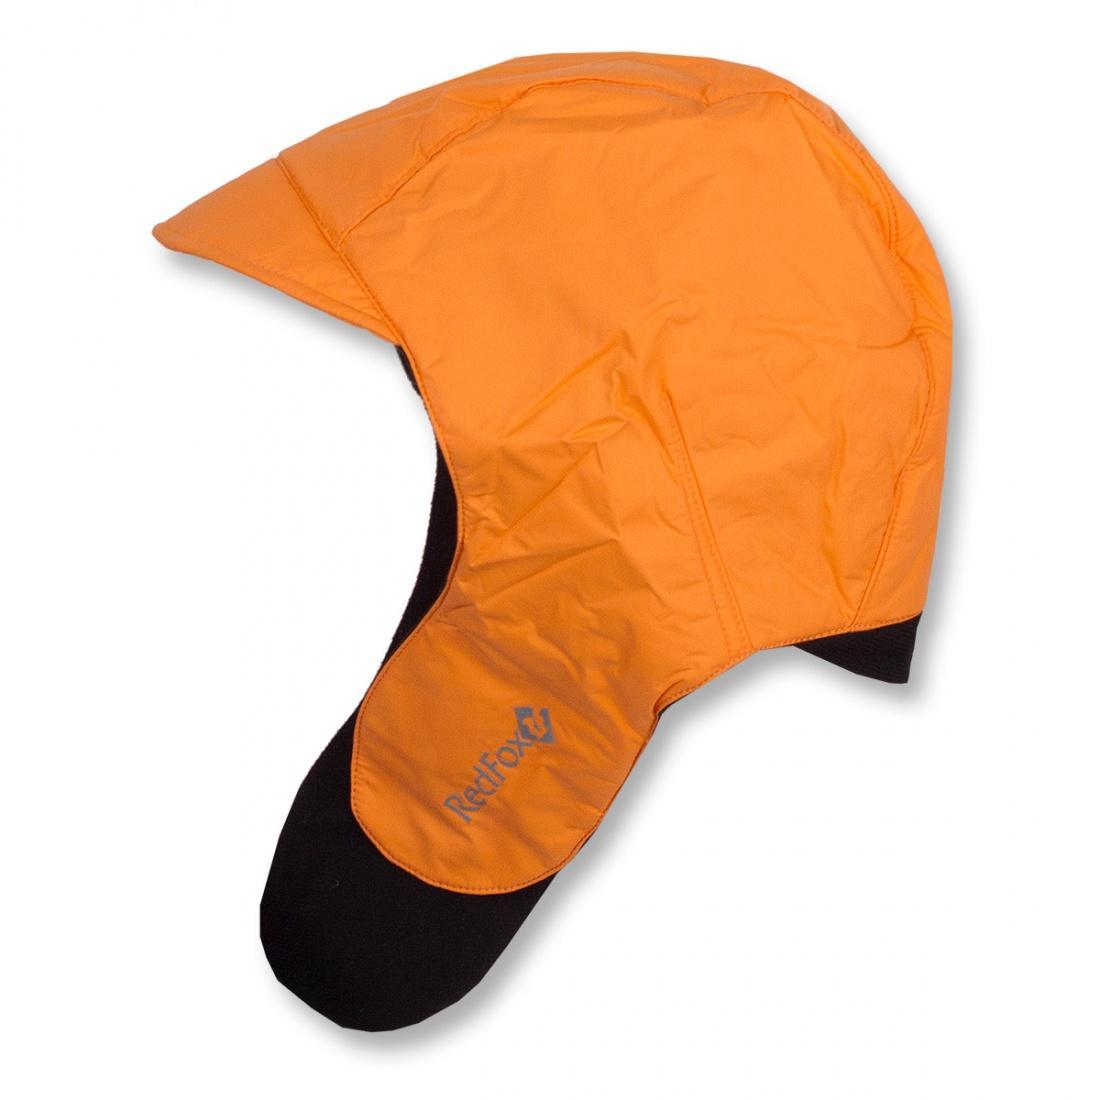 Шапка детская PilotУшанки<br><br> Удобная стильная шапочка для детей от года. <br><br> <br><br><br><br> Материал – Dry Factor 1000.<br><br> <br><br><br> Утеплитель – Omniterm Classic.<br><br> <br>&lt;...<br><br>Цвет: Оранжевый<br>Размер: XXL